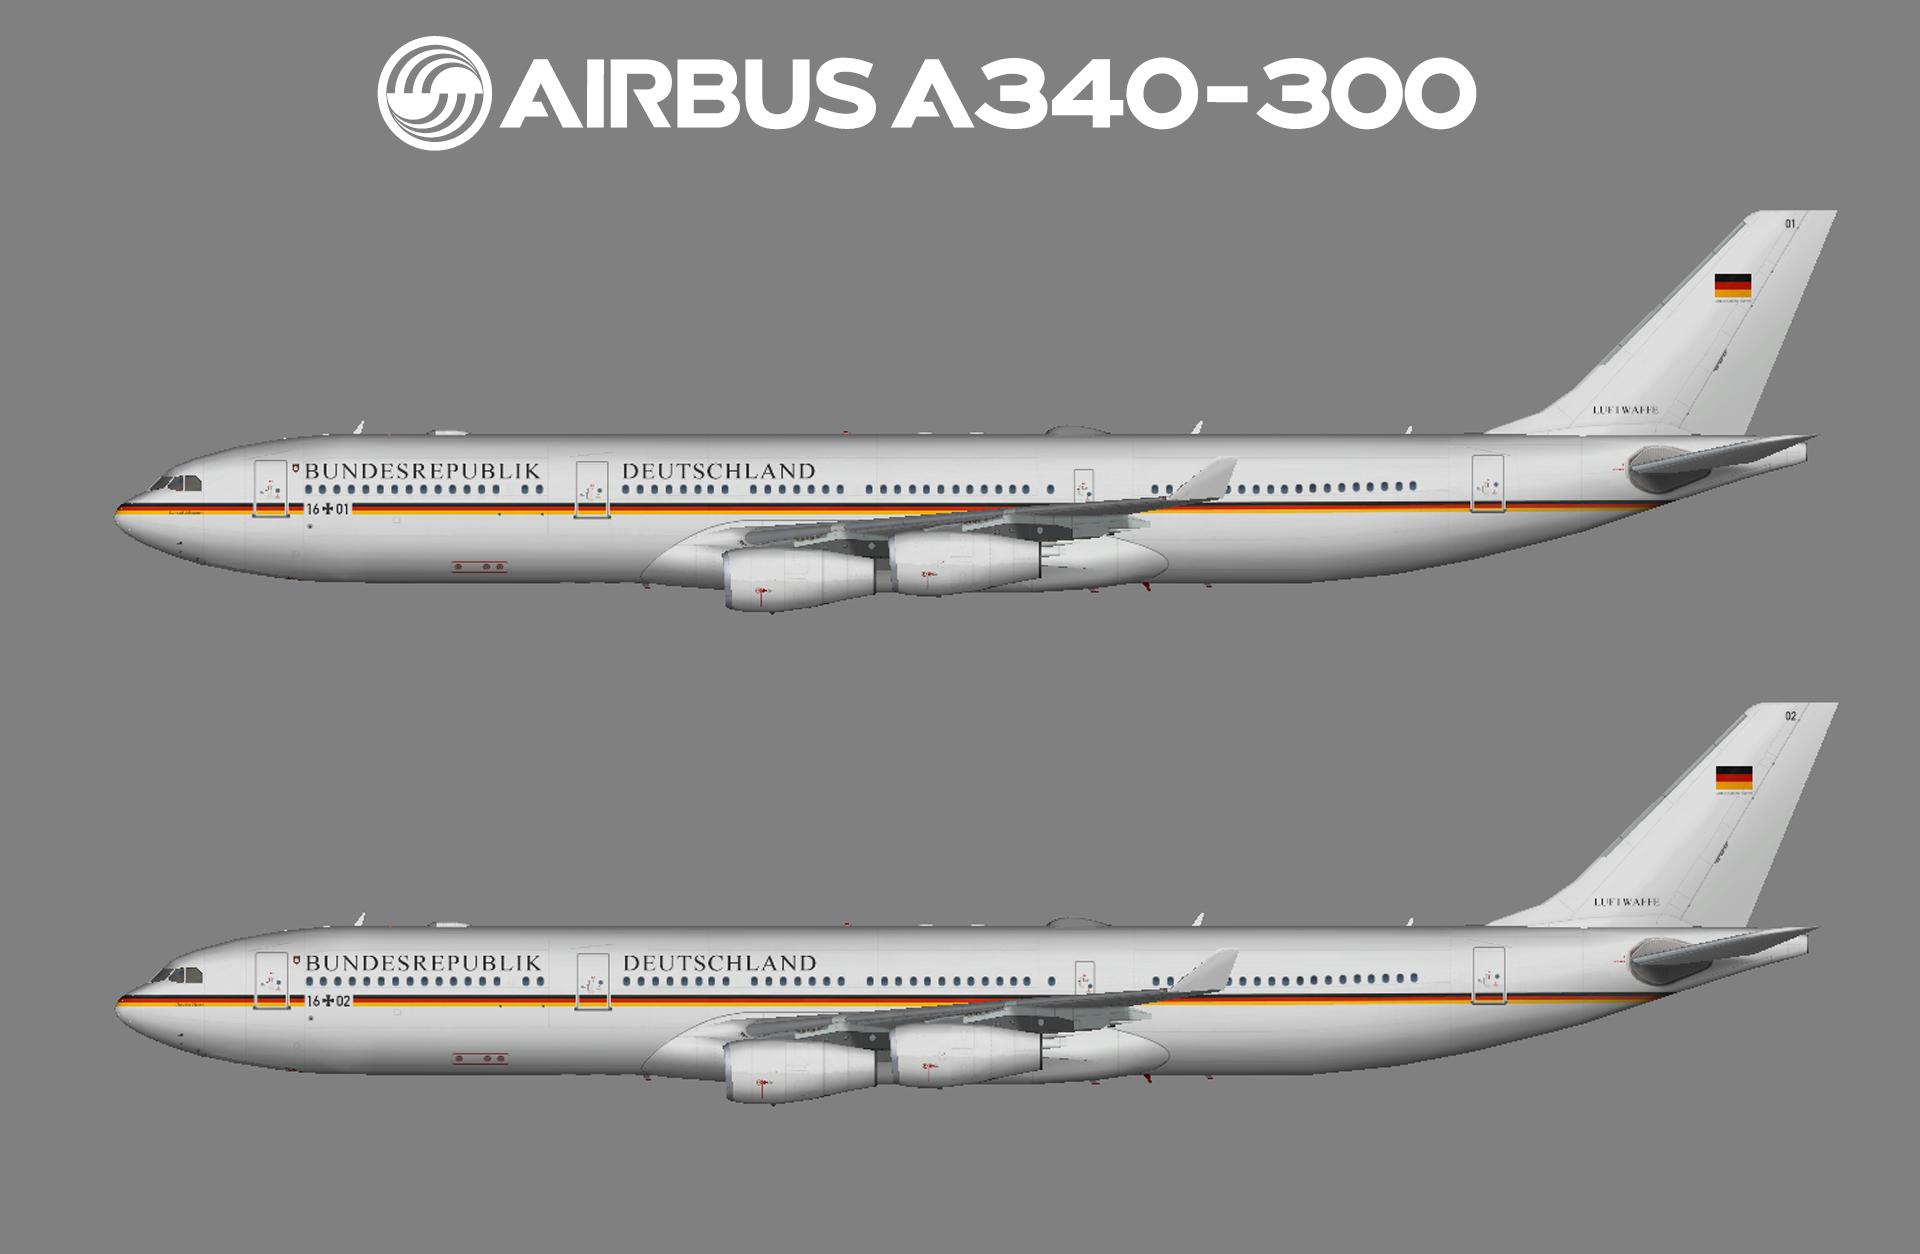 Luftwaffe (German Air Force) Airbus A340-300